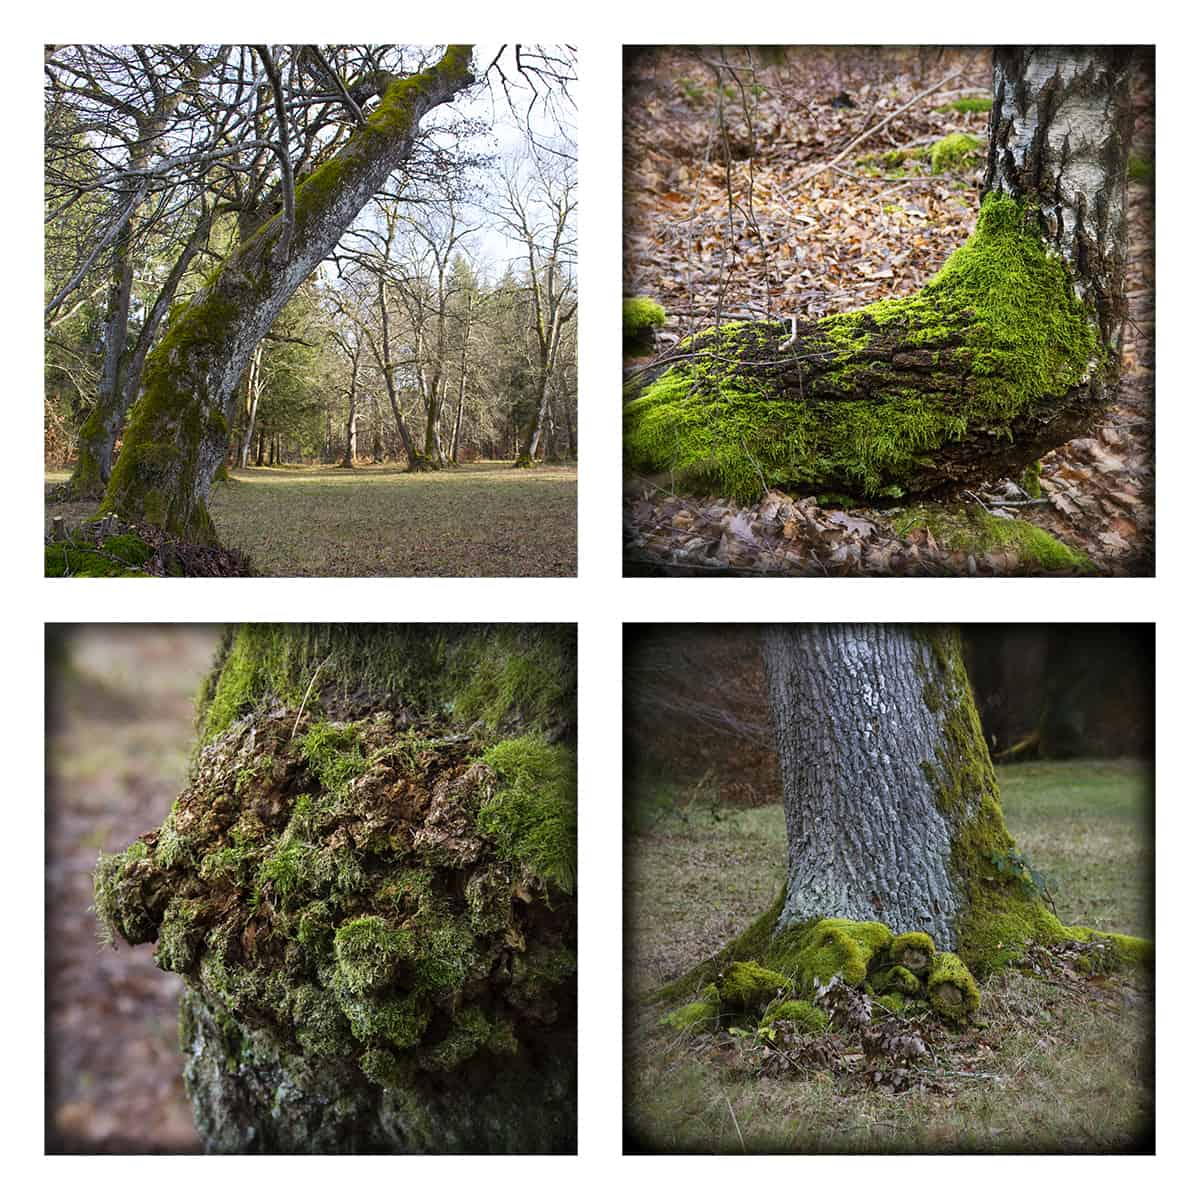 MAGIC FOREST LXXIII